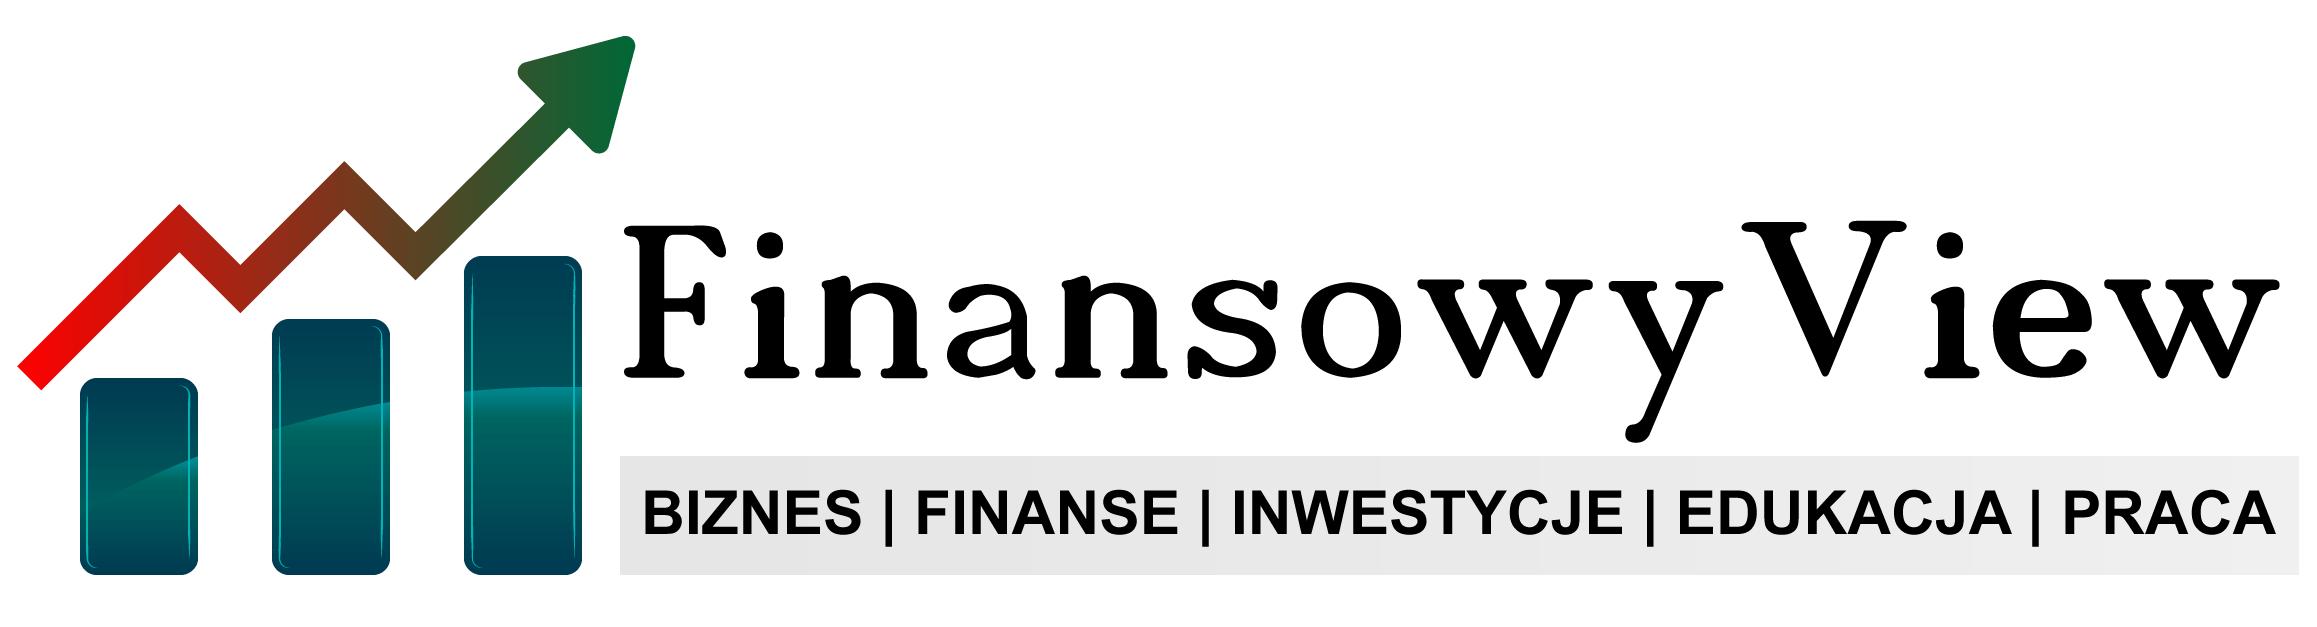 FinansowyView.pl